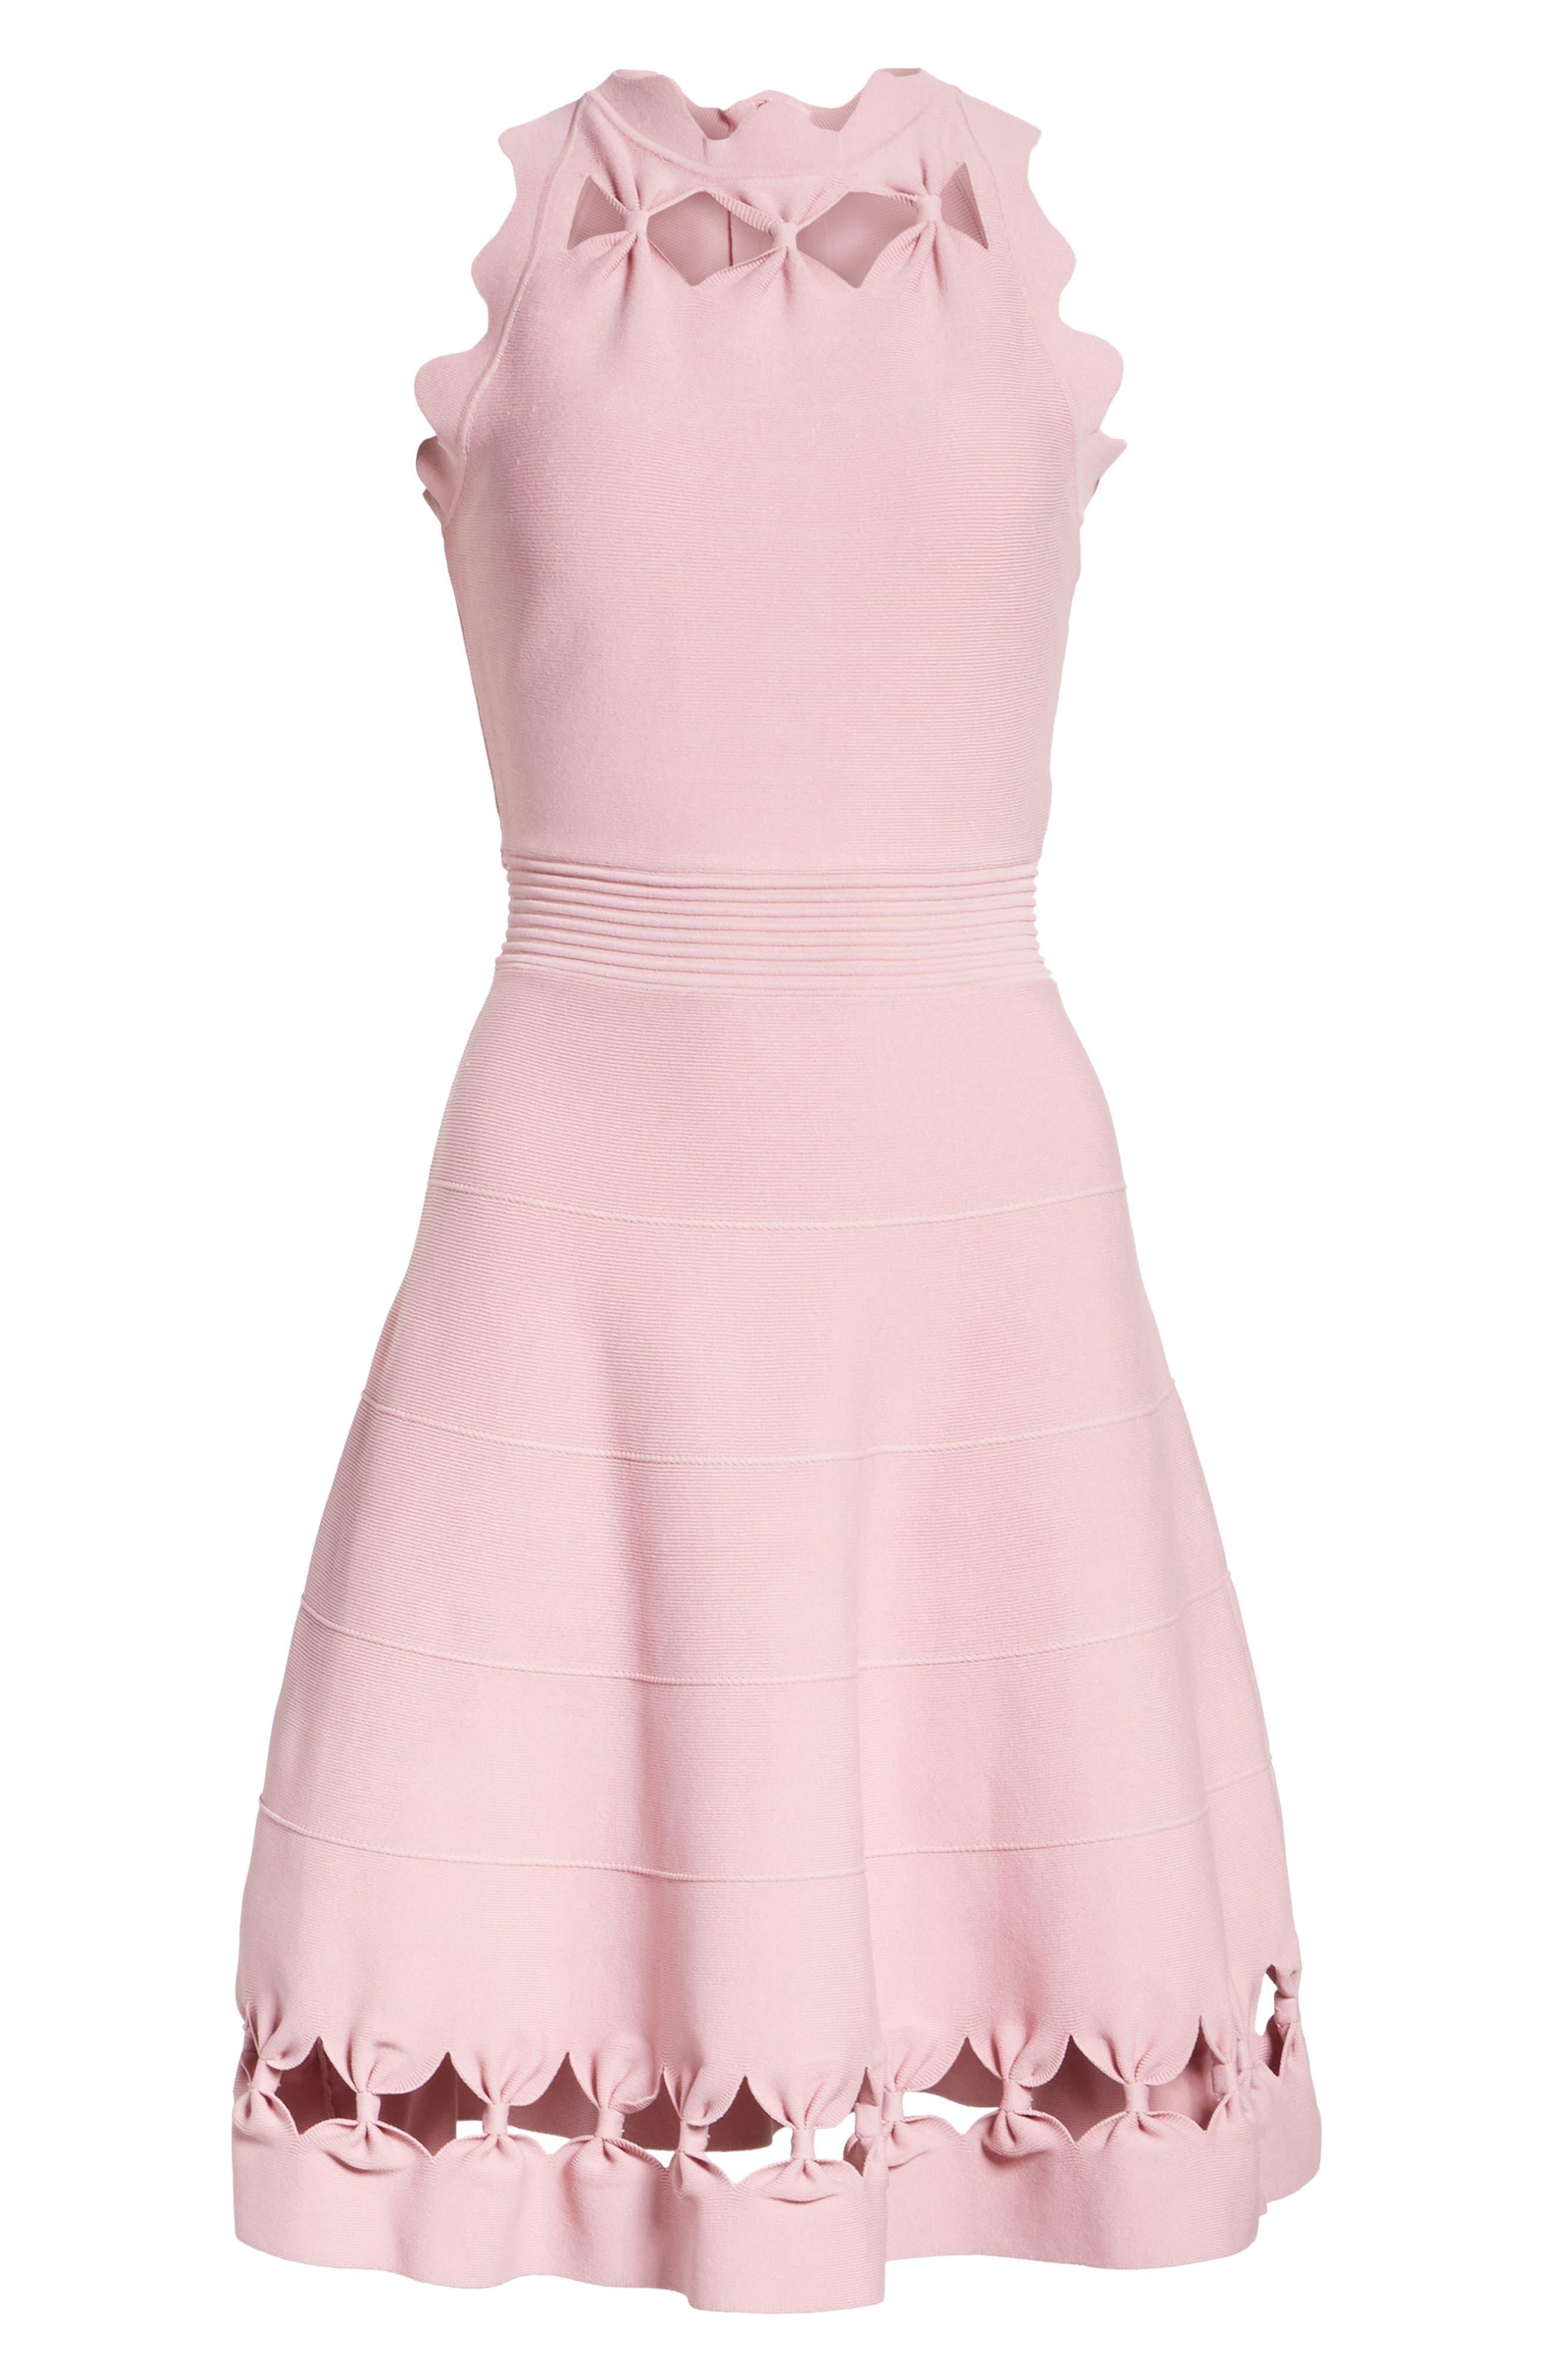 Bow Detail Knit Fit & Flare Dress,                             Alternate thumbnail 6, color,                             Dusky Pink